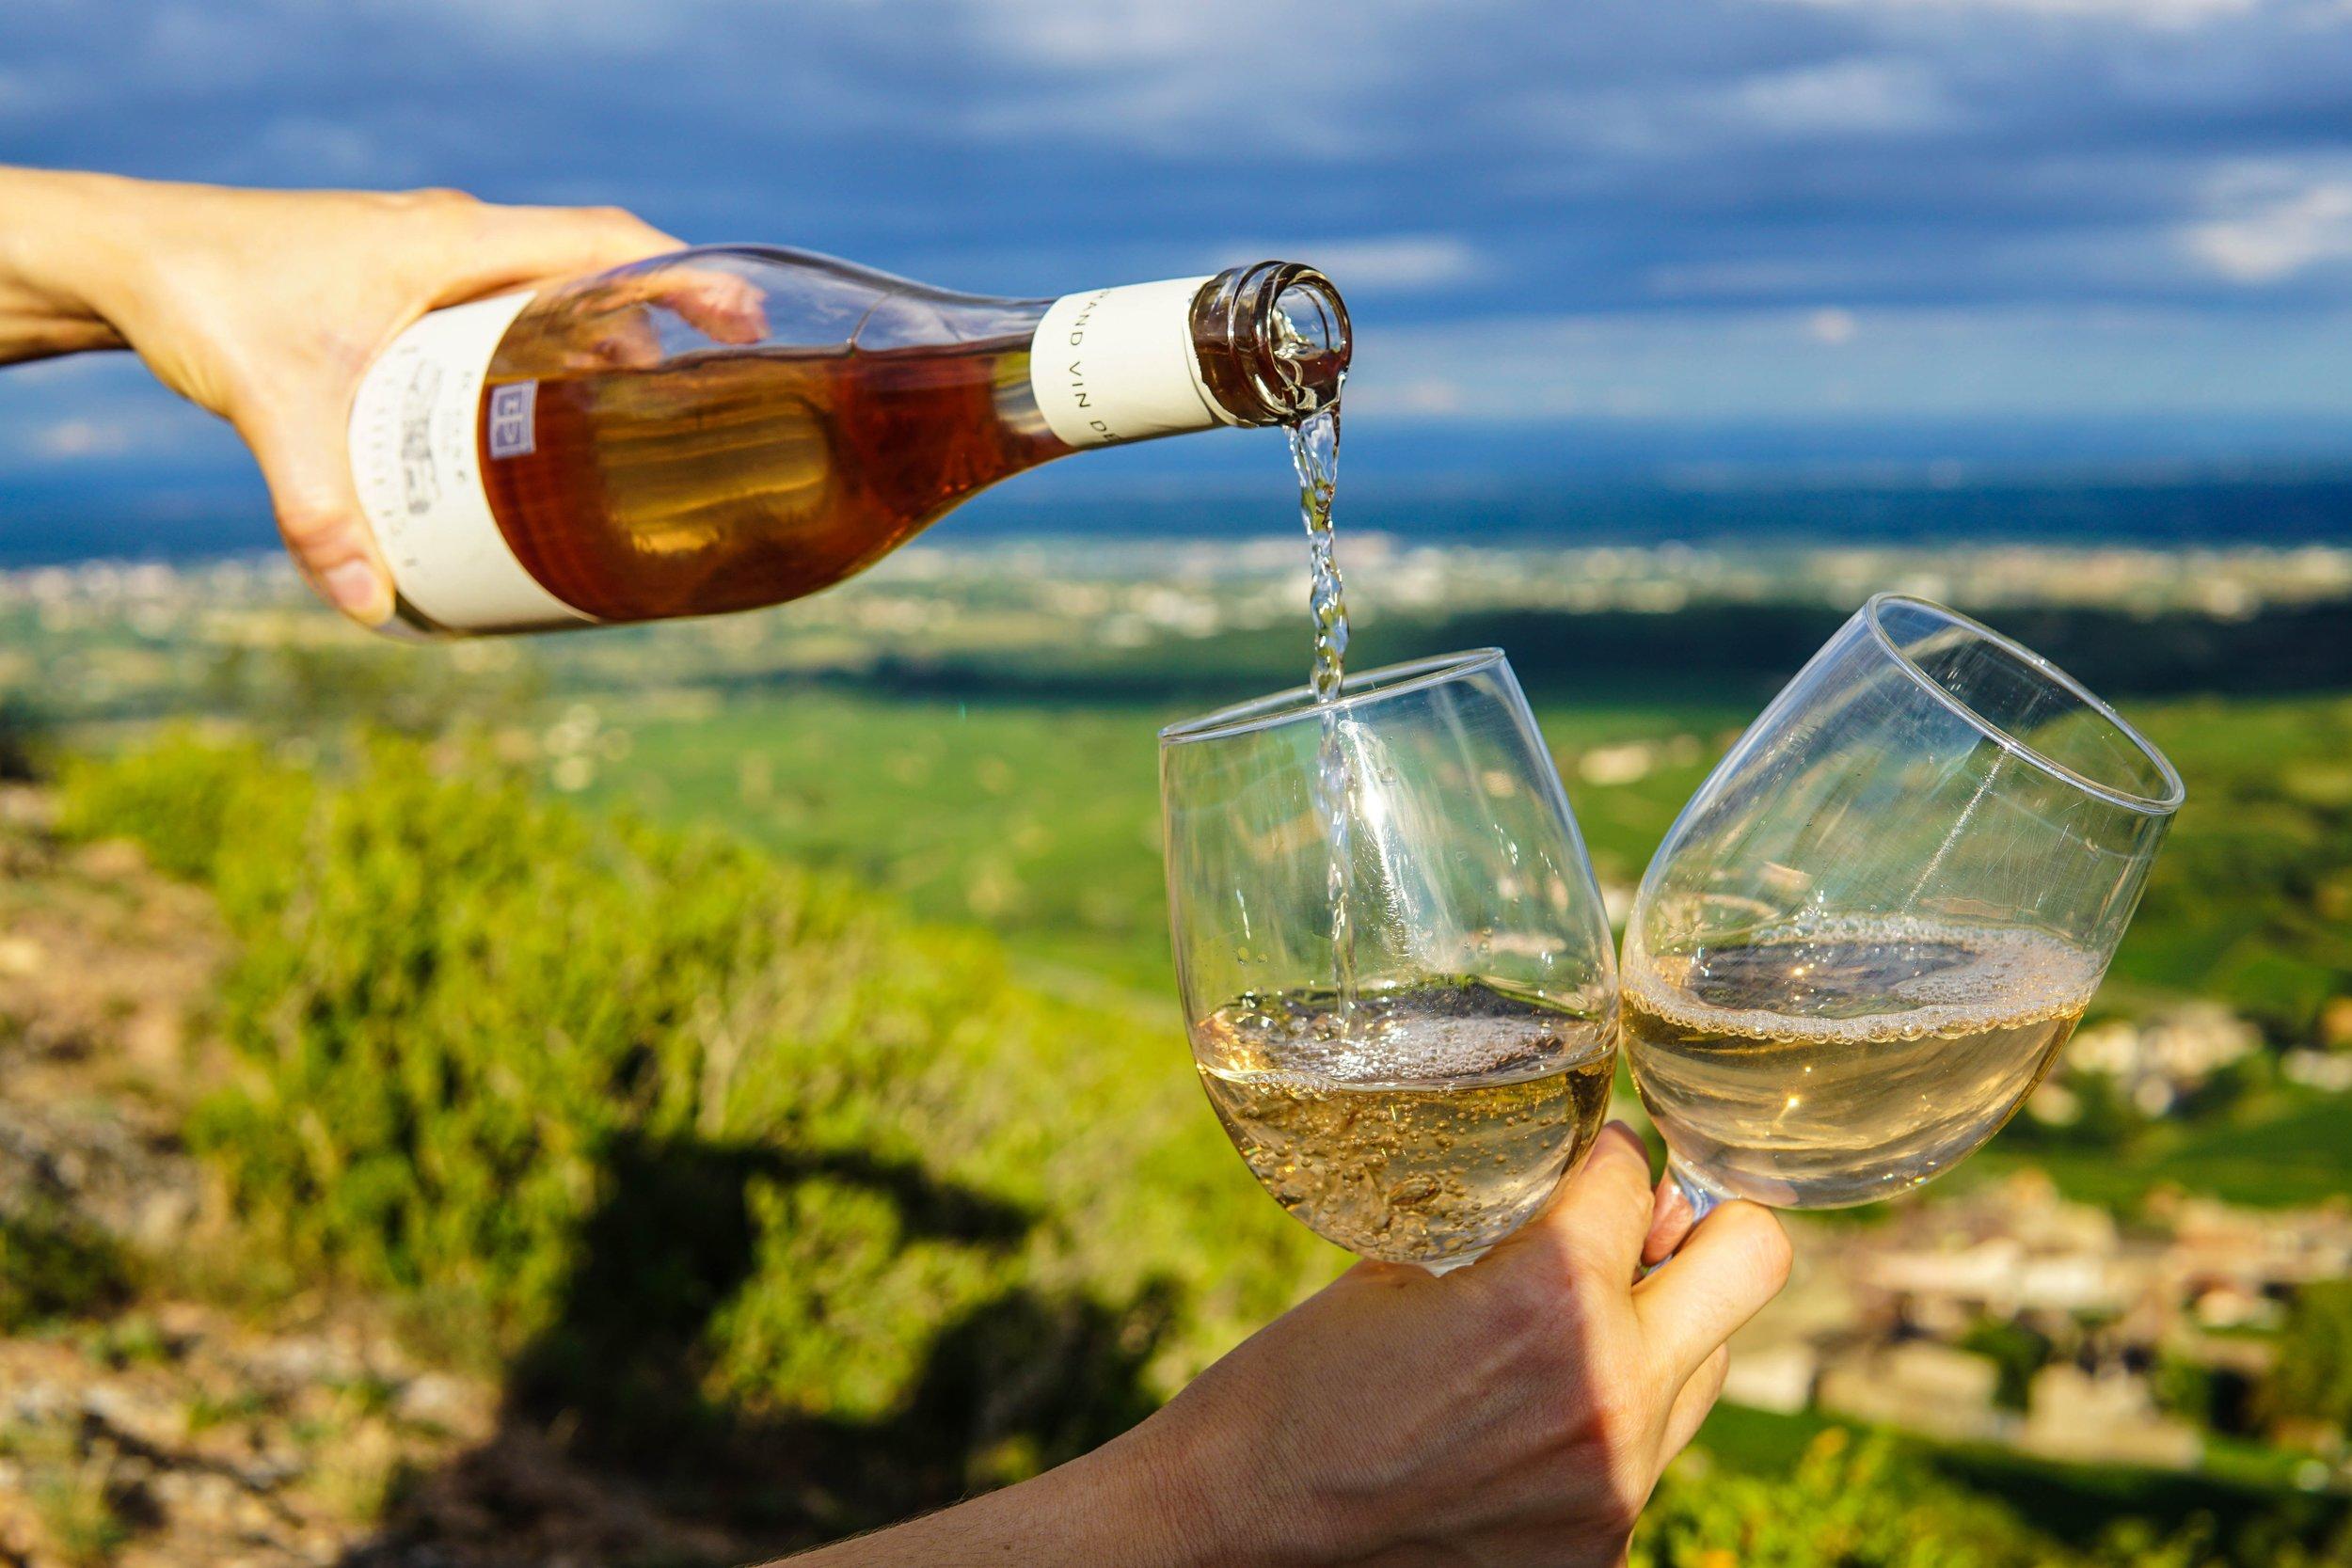 spokane-wine-club-vineyard-with-drinks-wine-being-poured.jpg